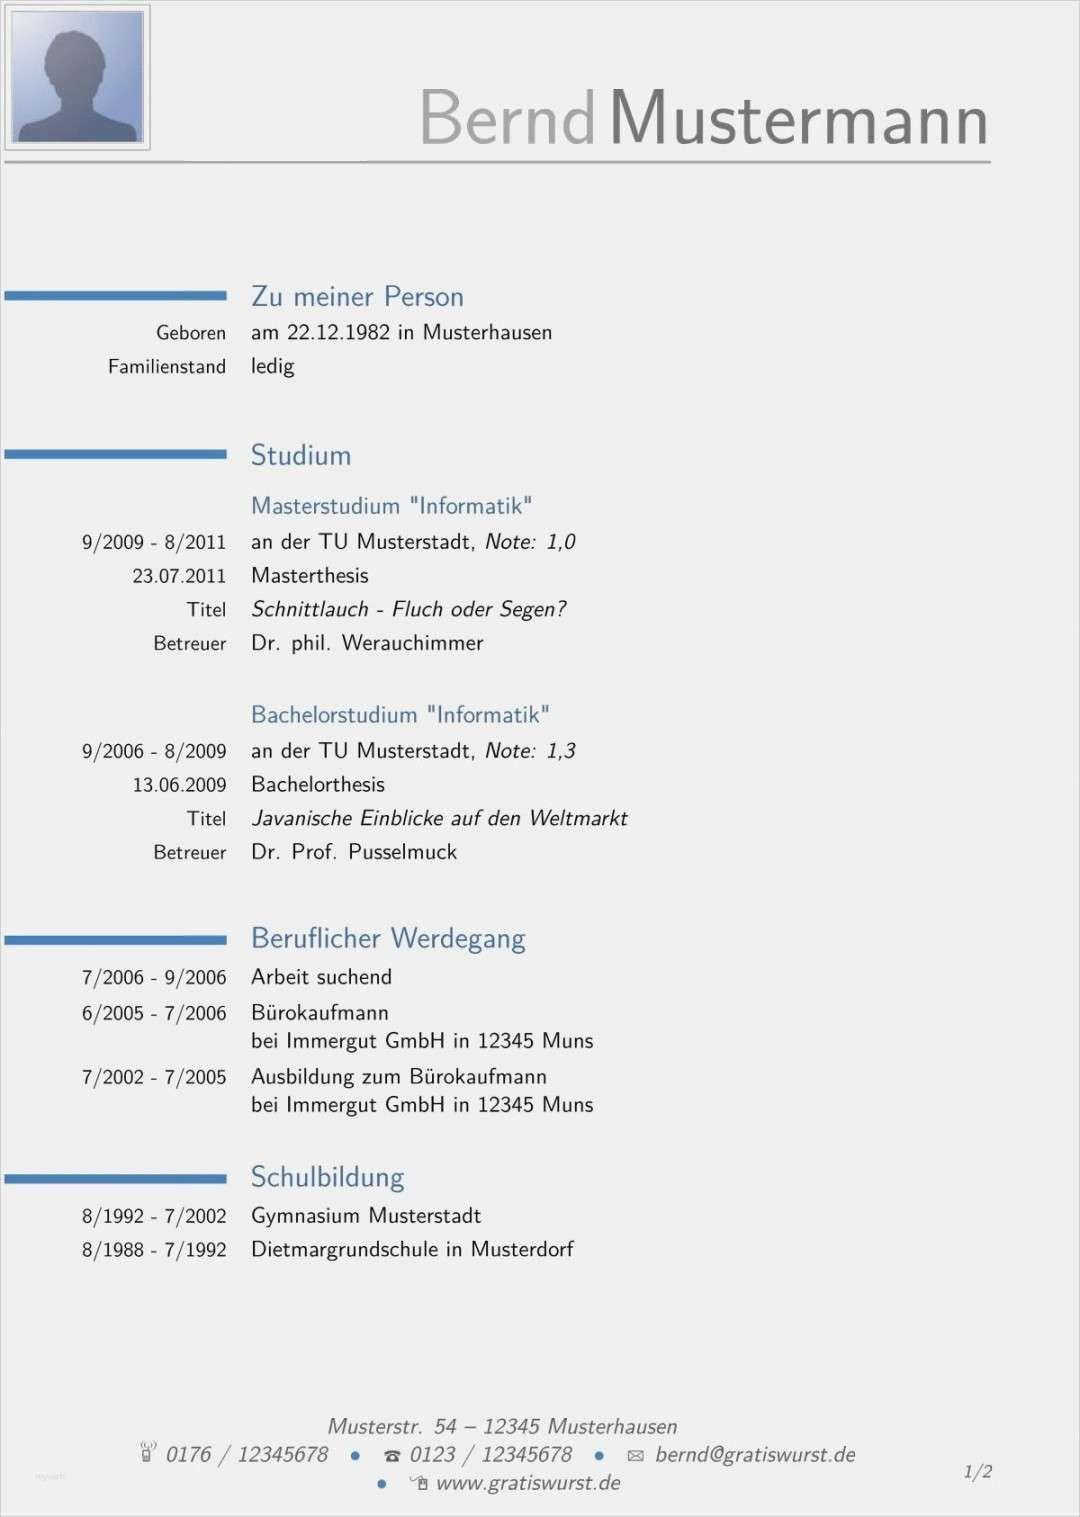 Atemberaubend Lebenslauf 9 Klasse Vorlage In 2020 Vorlagen Lebenslauf Lebenslauf Lebenslauf Muster